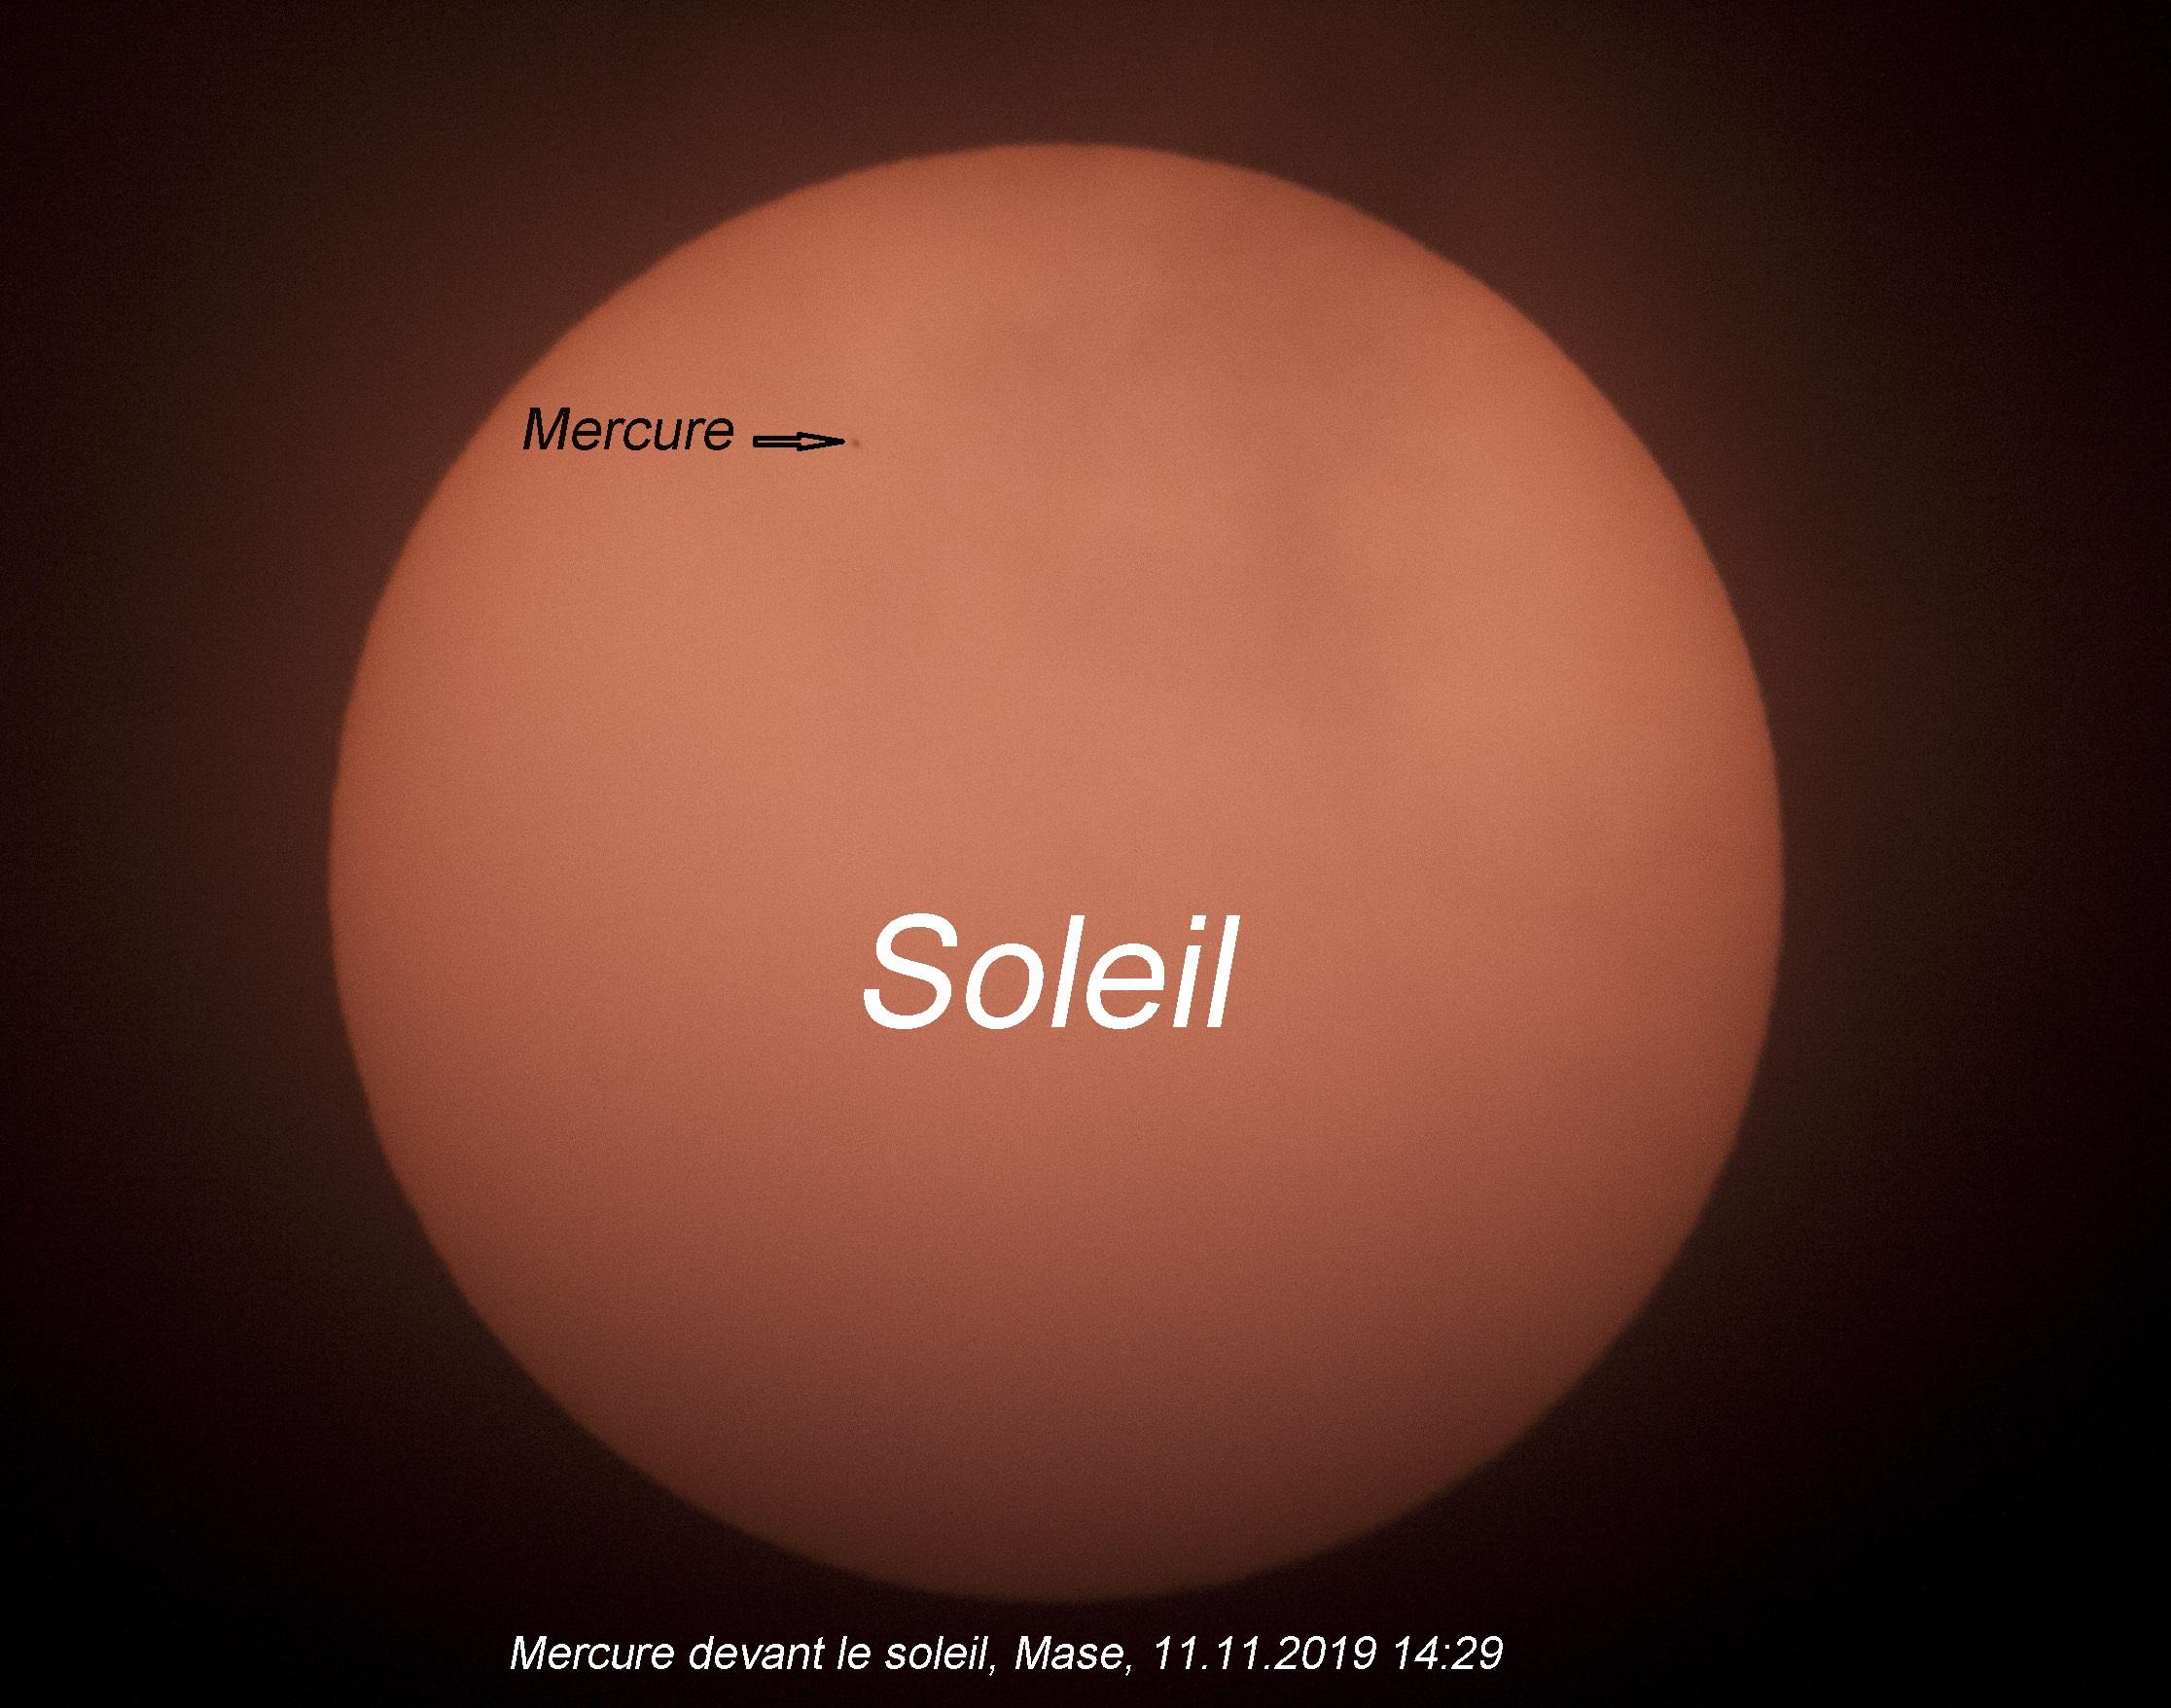 20191111 1429 Soleil Mercure